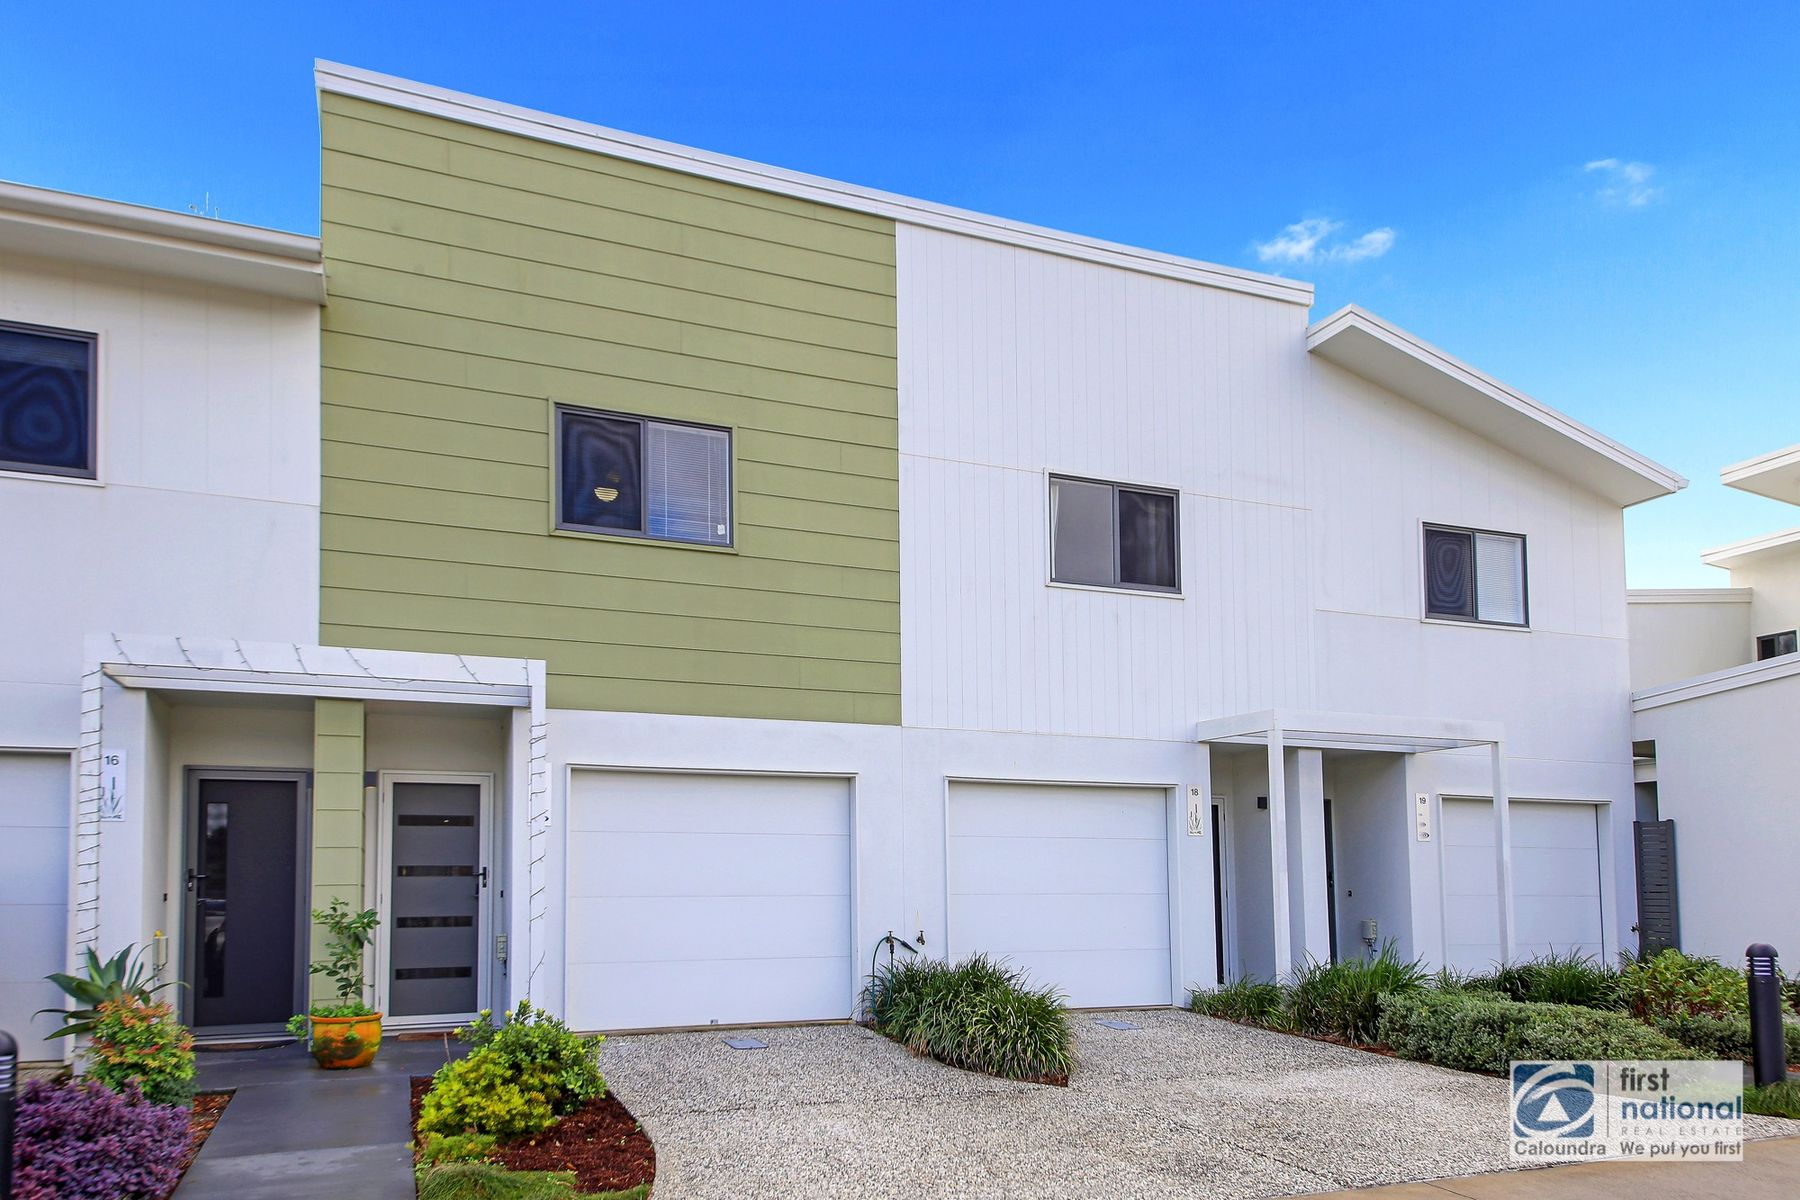 17/9 Ellis Way, Meridan Plains, QLD 4551